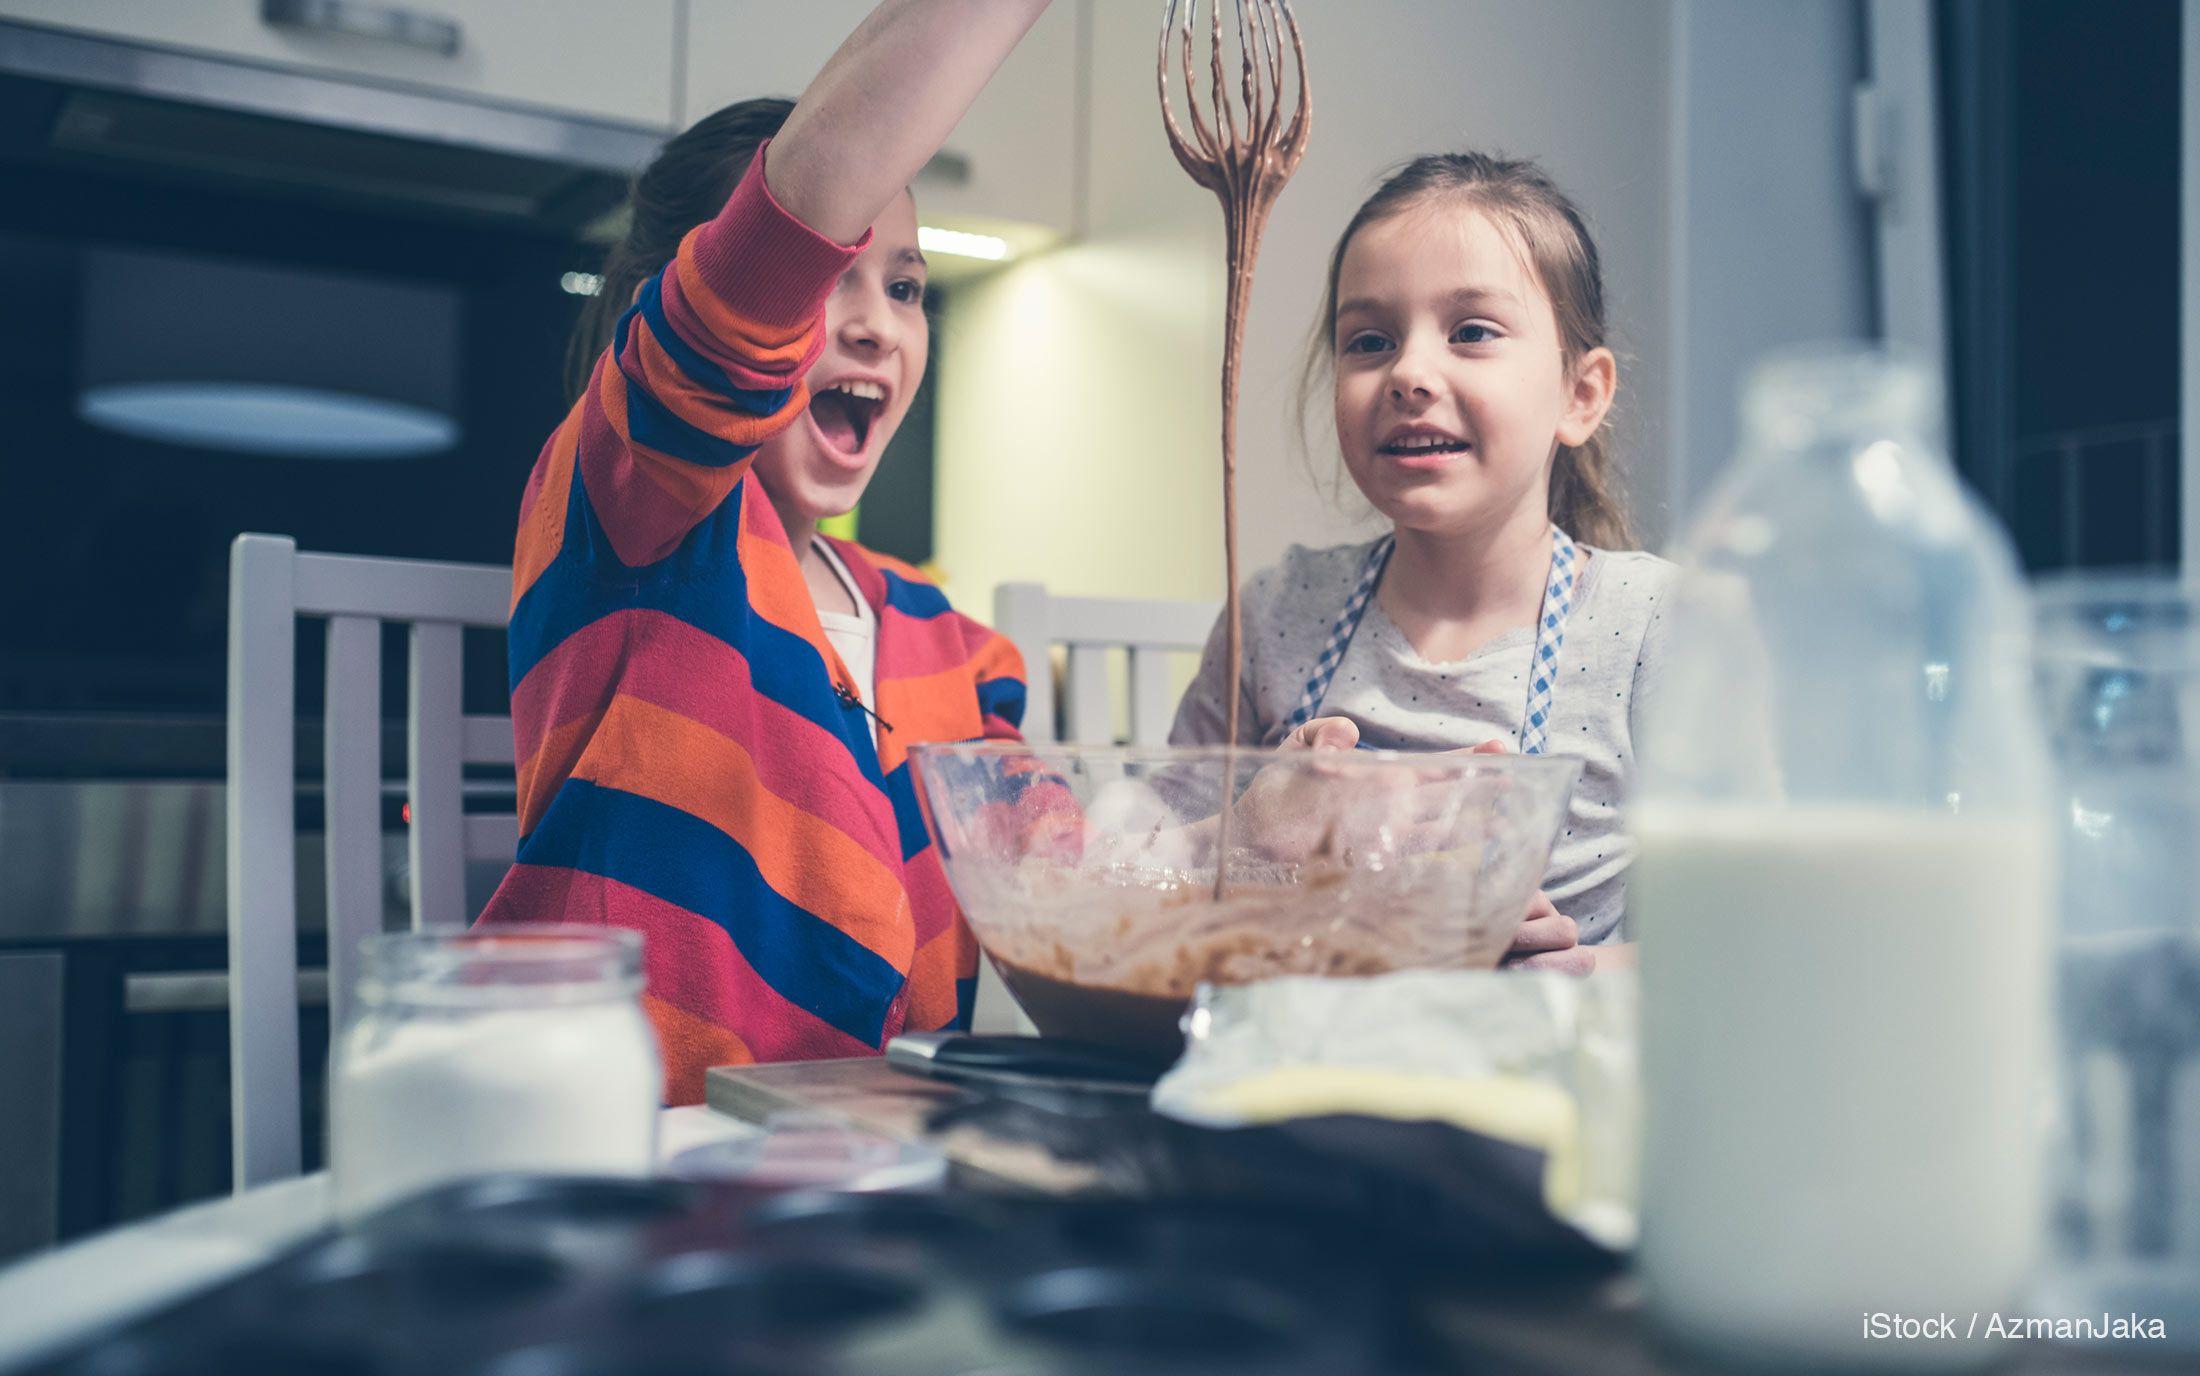 helping prepare meal chore